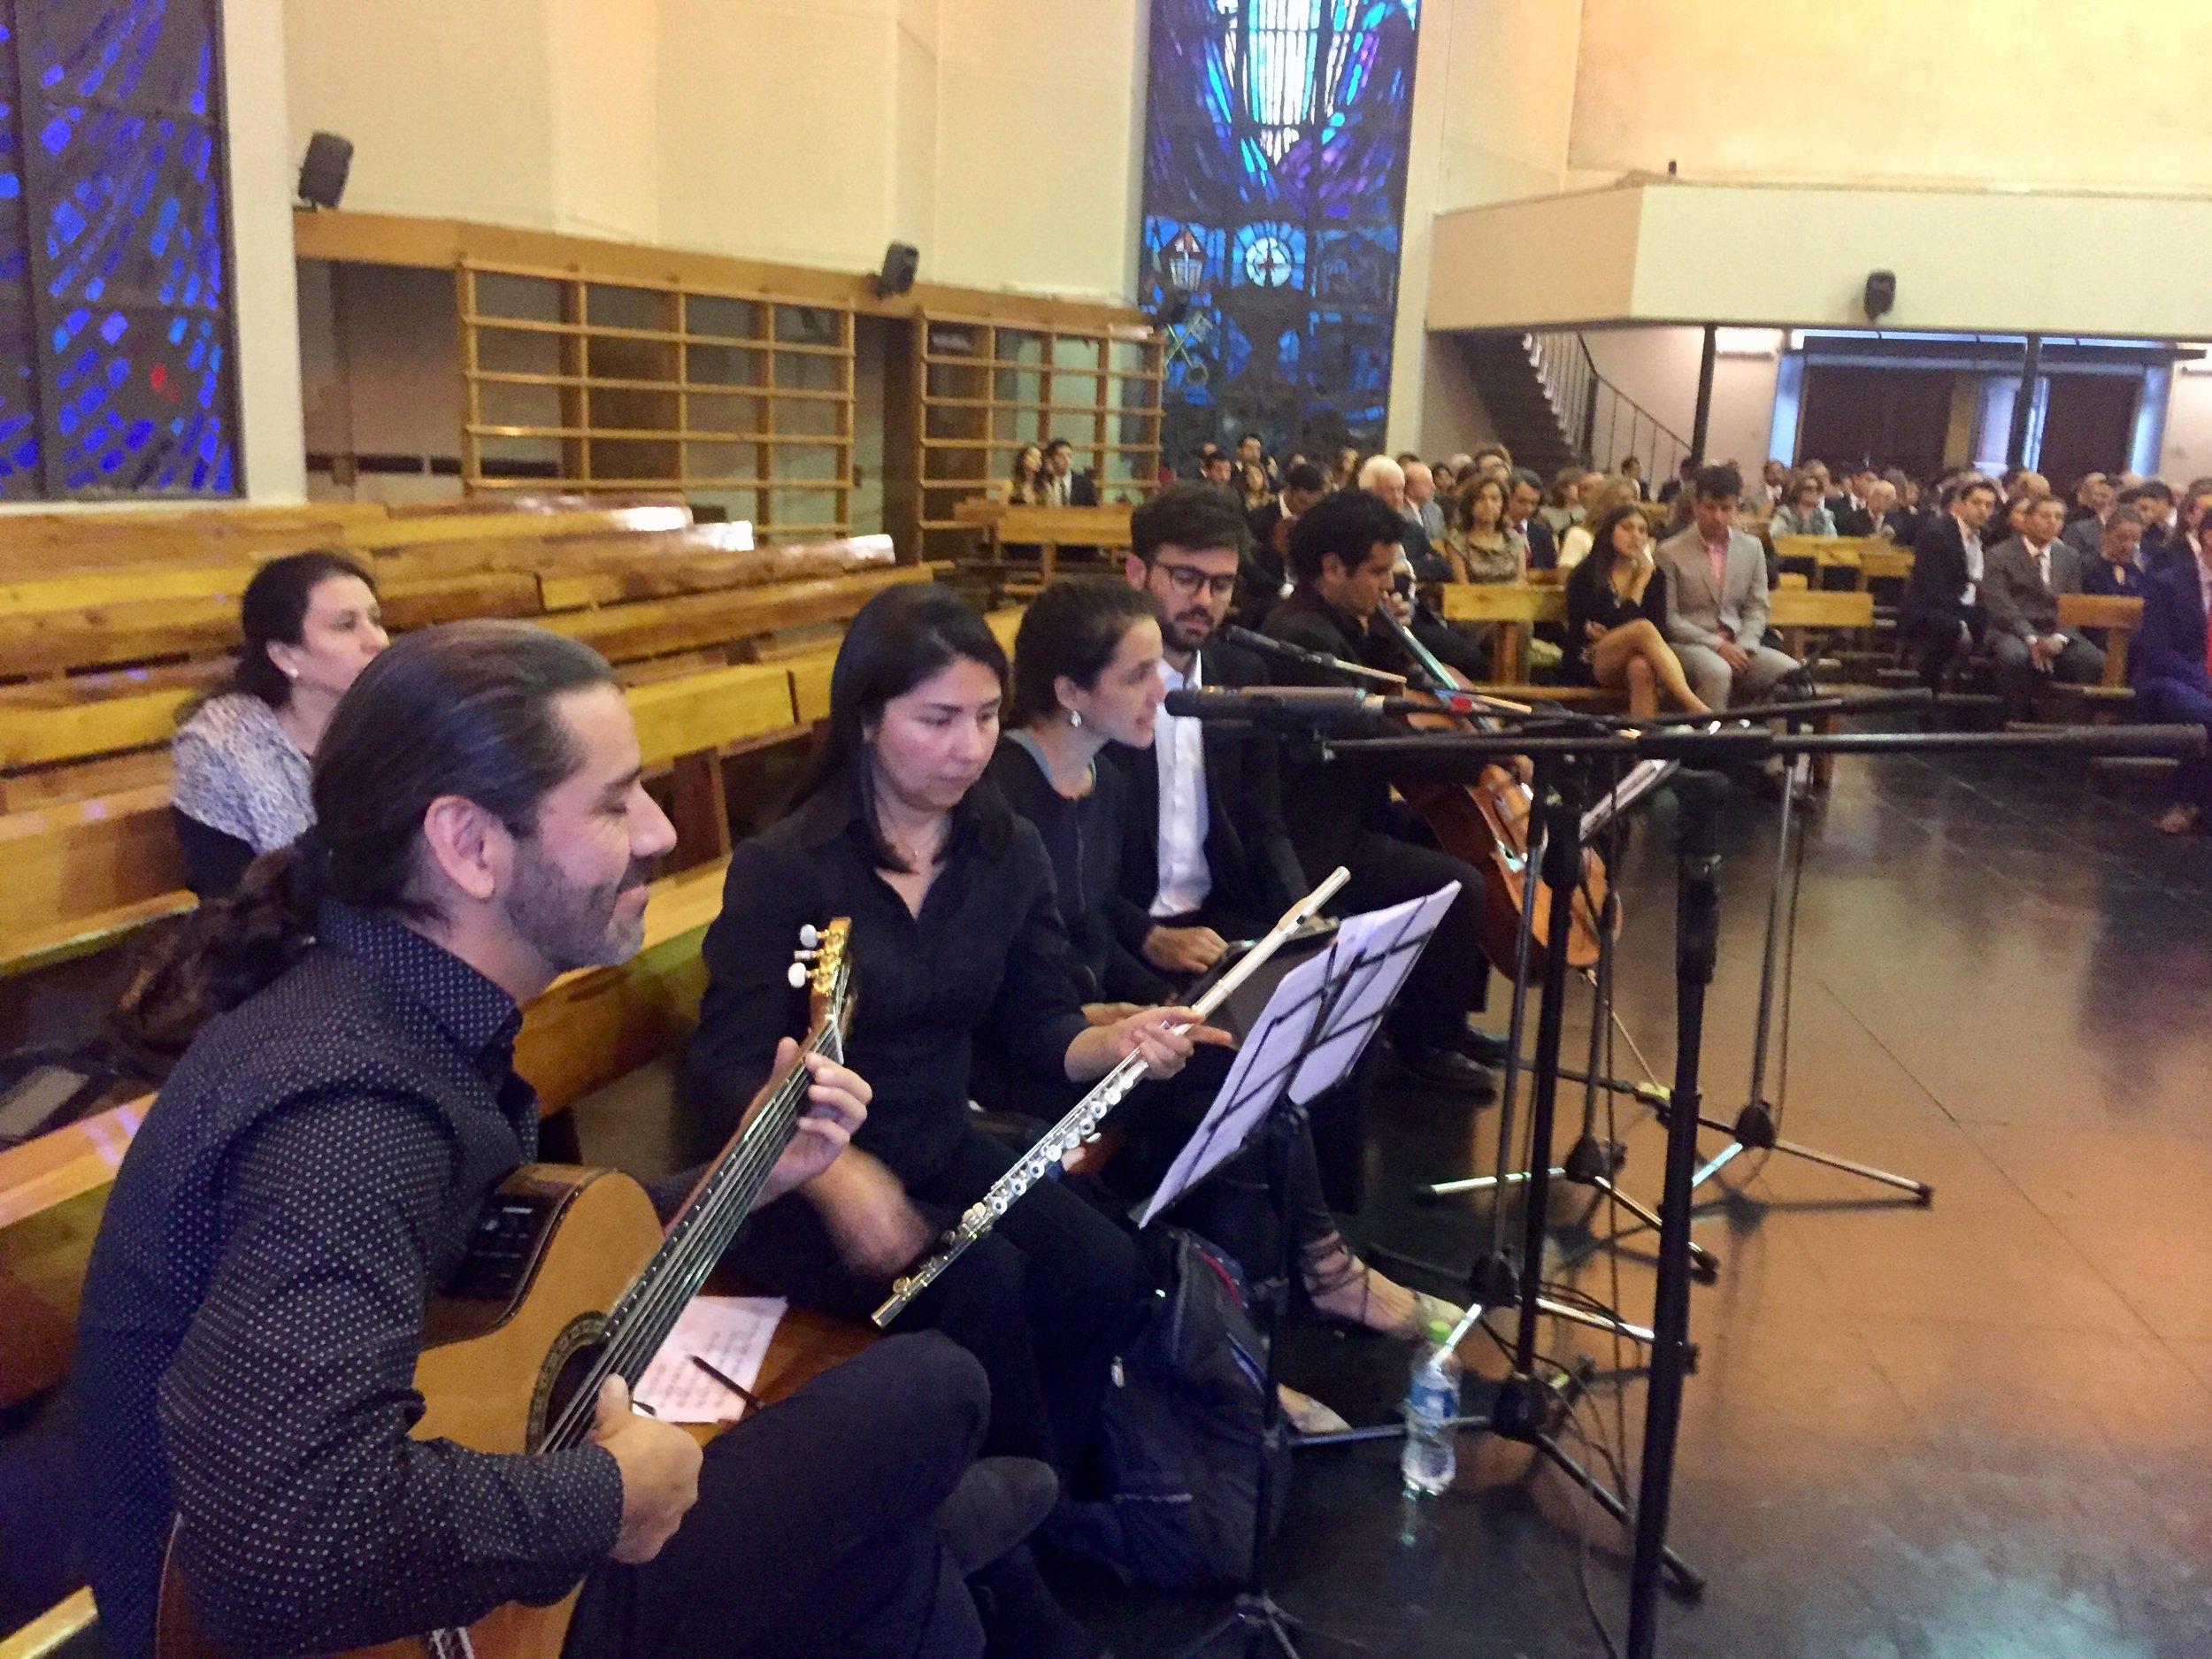 Guitarra clásica, flauta traversa, cello, voces Josefina Echenique y Benjamín Walker